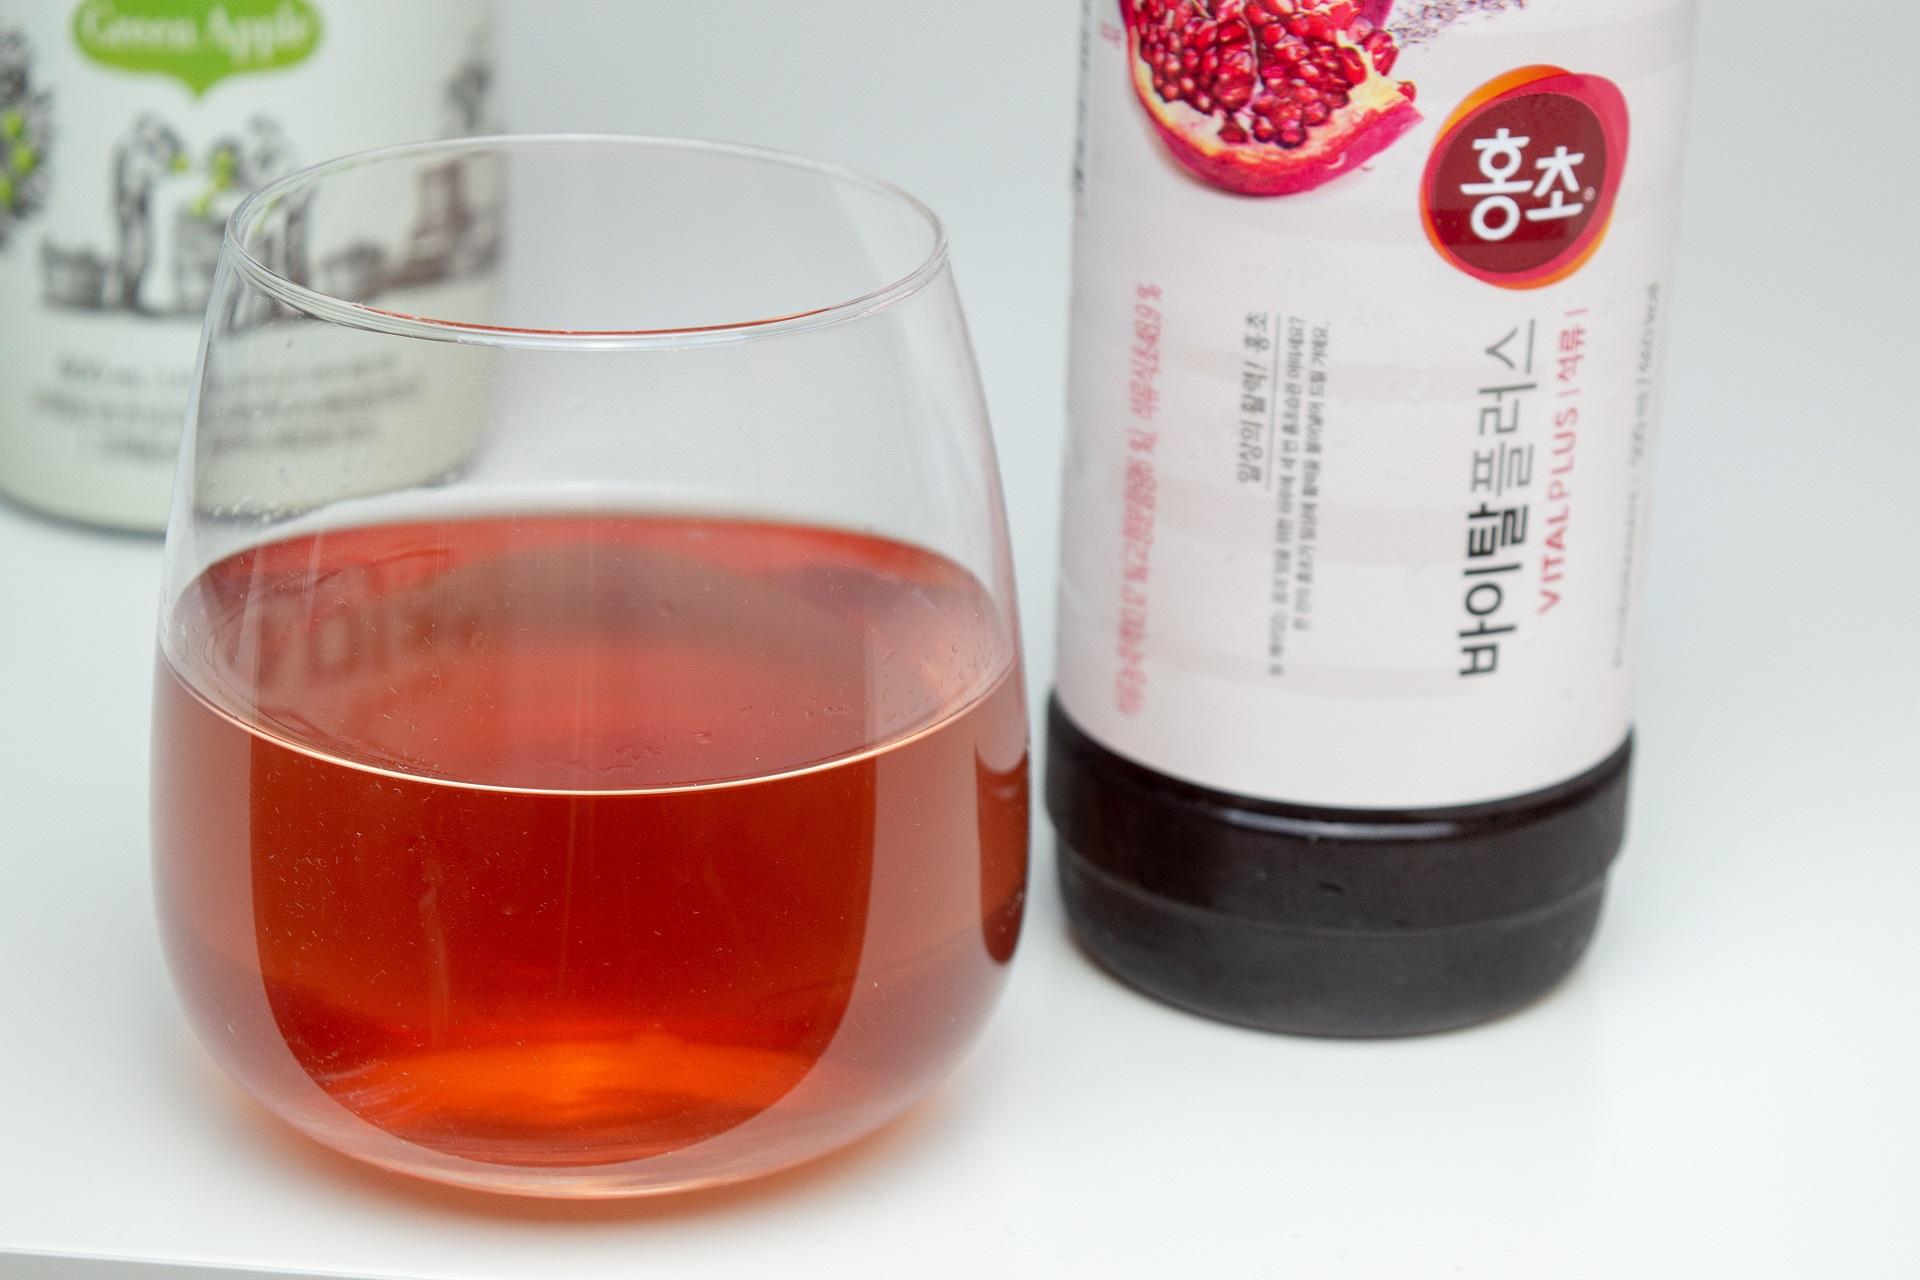 hongcho drink